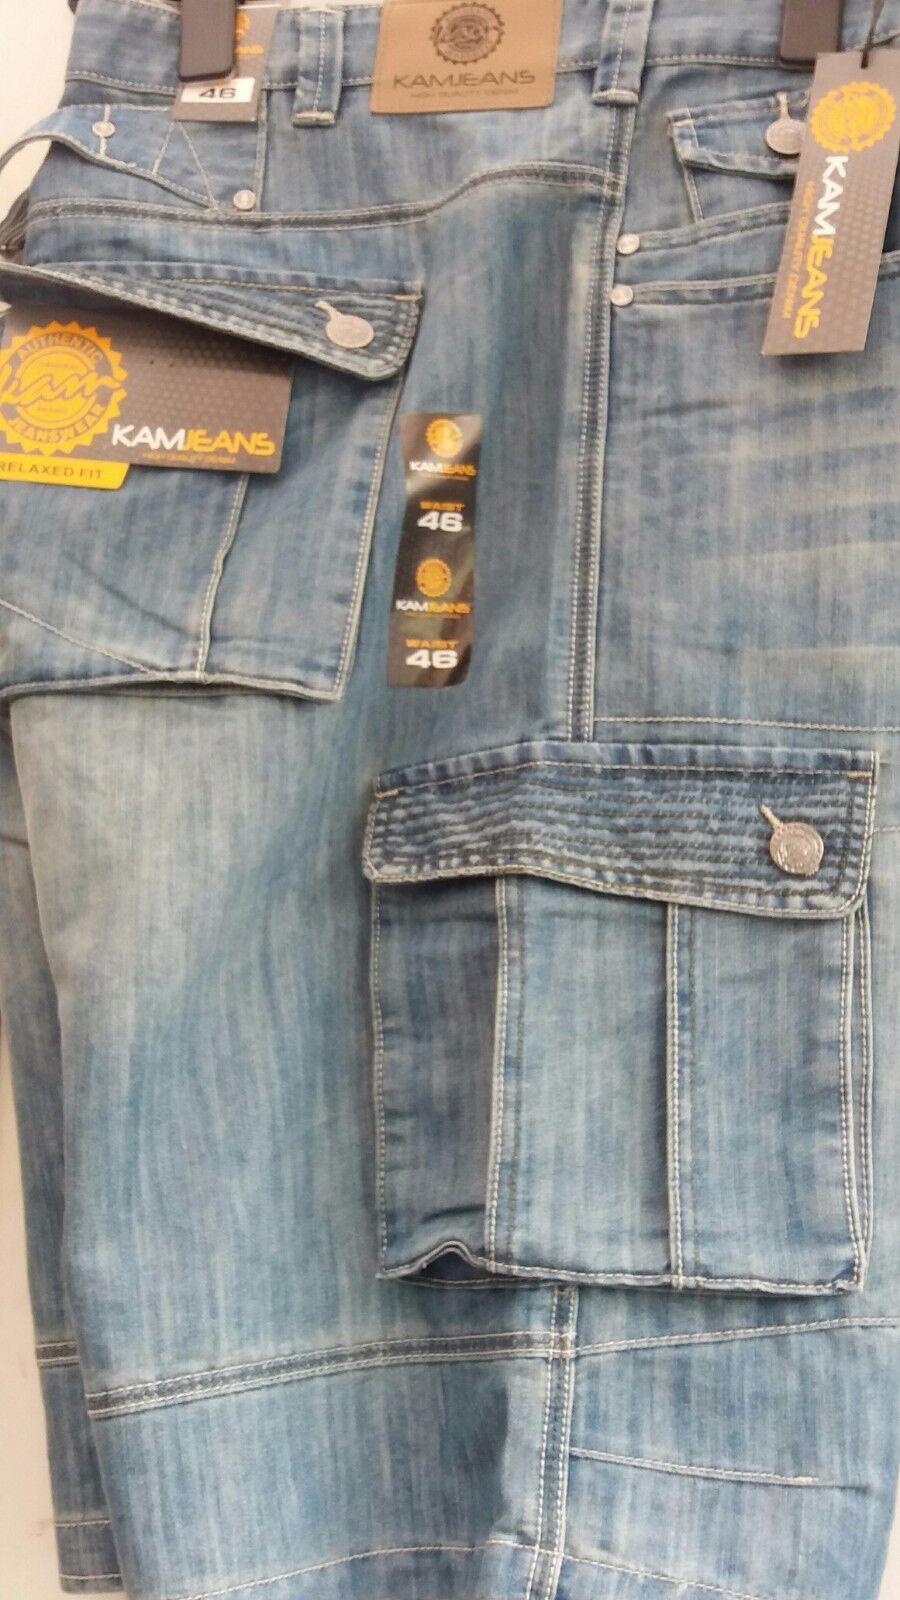 Kam Mario Grande Tamaño King Size Lavado Suave Pantalones Cortos, 102cm42 44 46